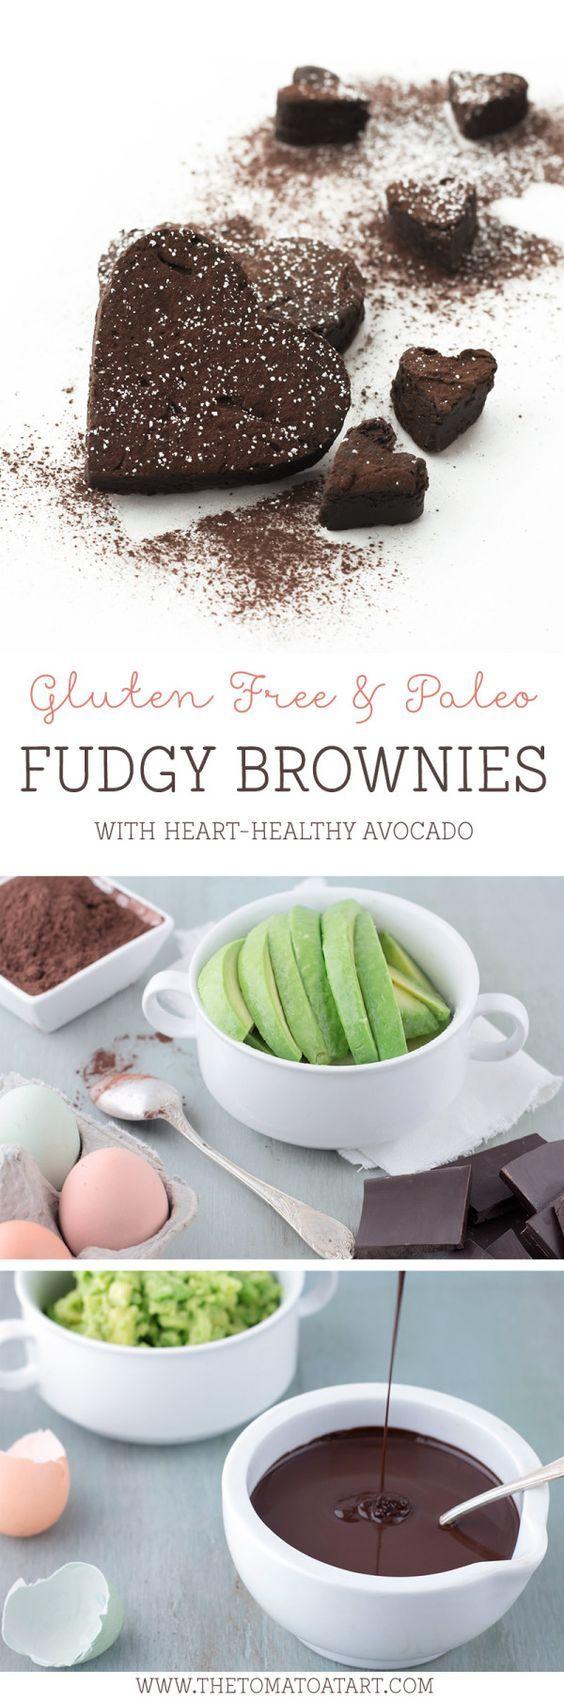 Paleo, Grain Free, Gluten Free Brownies made with AVOCADO!